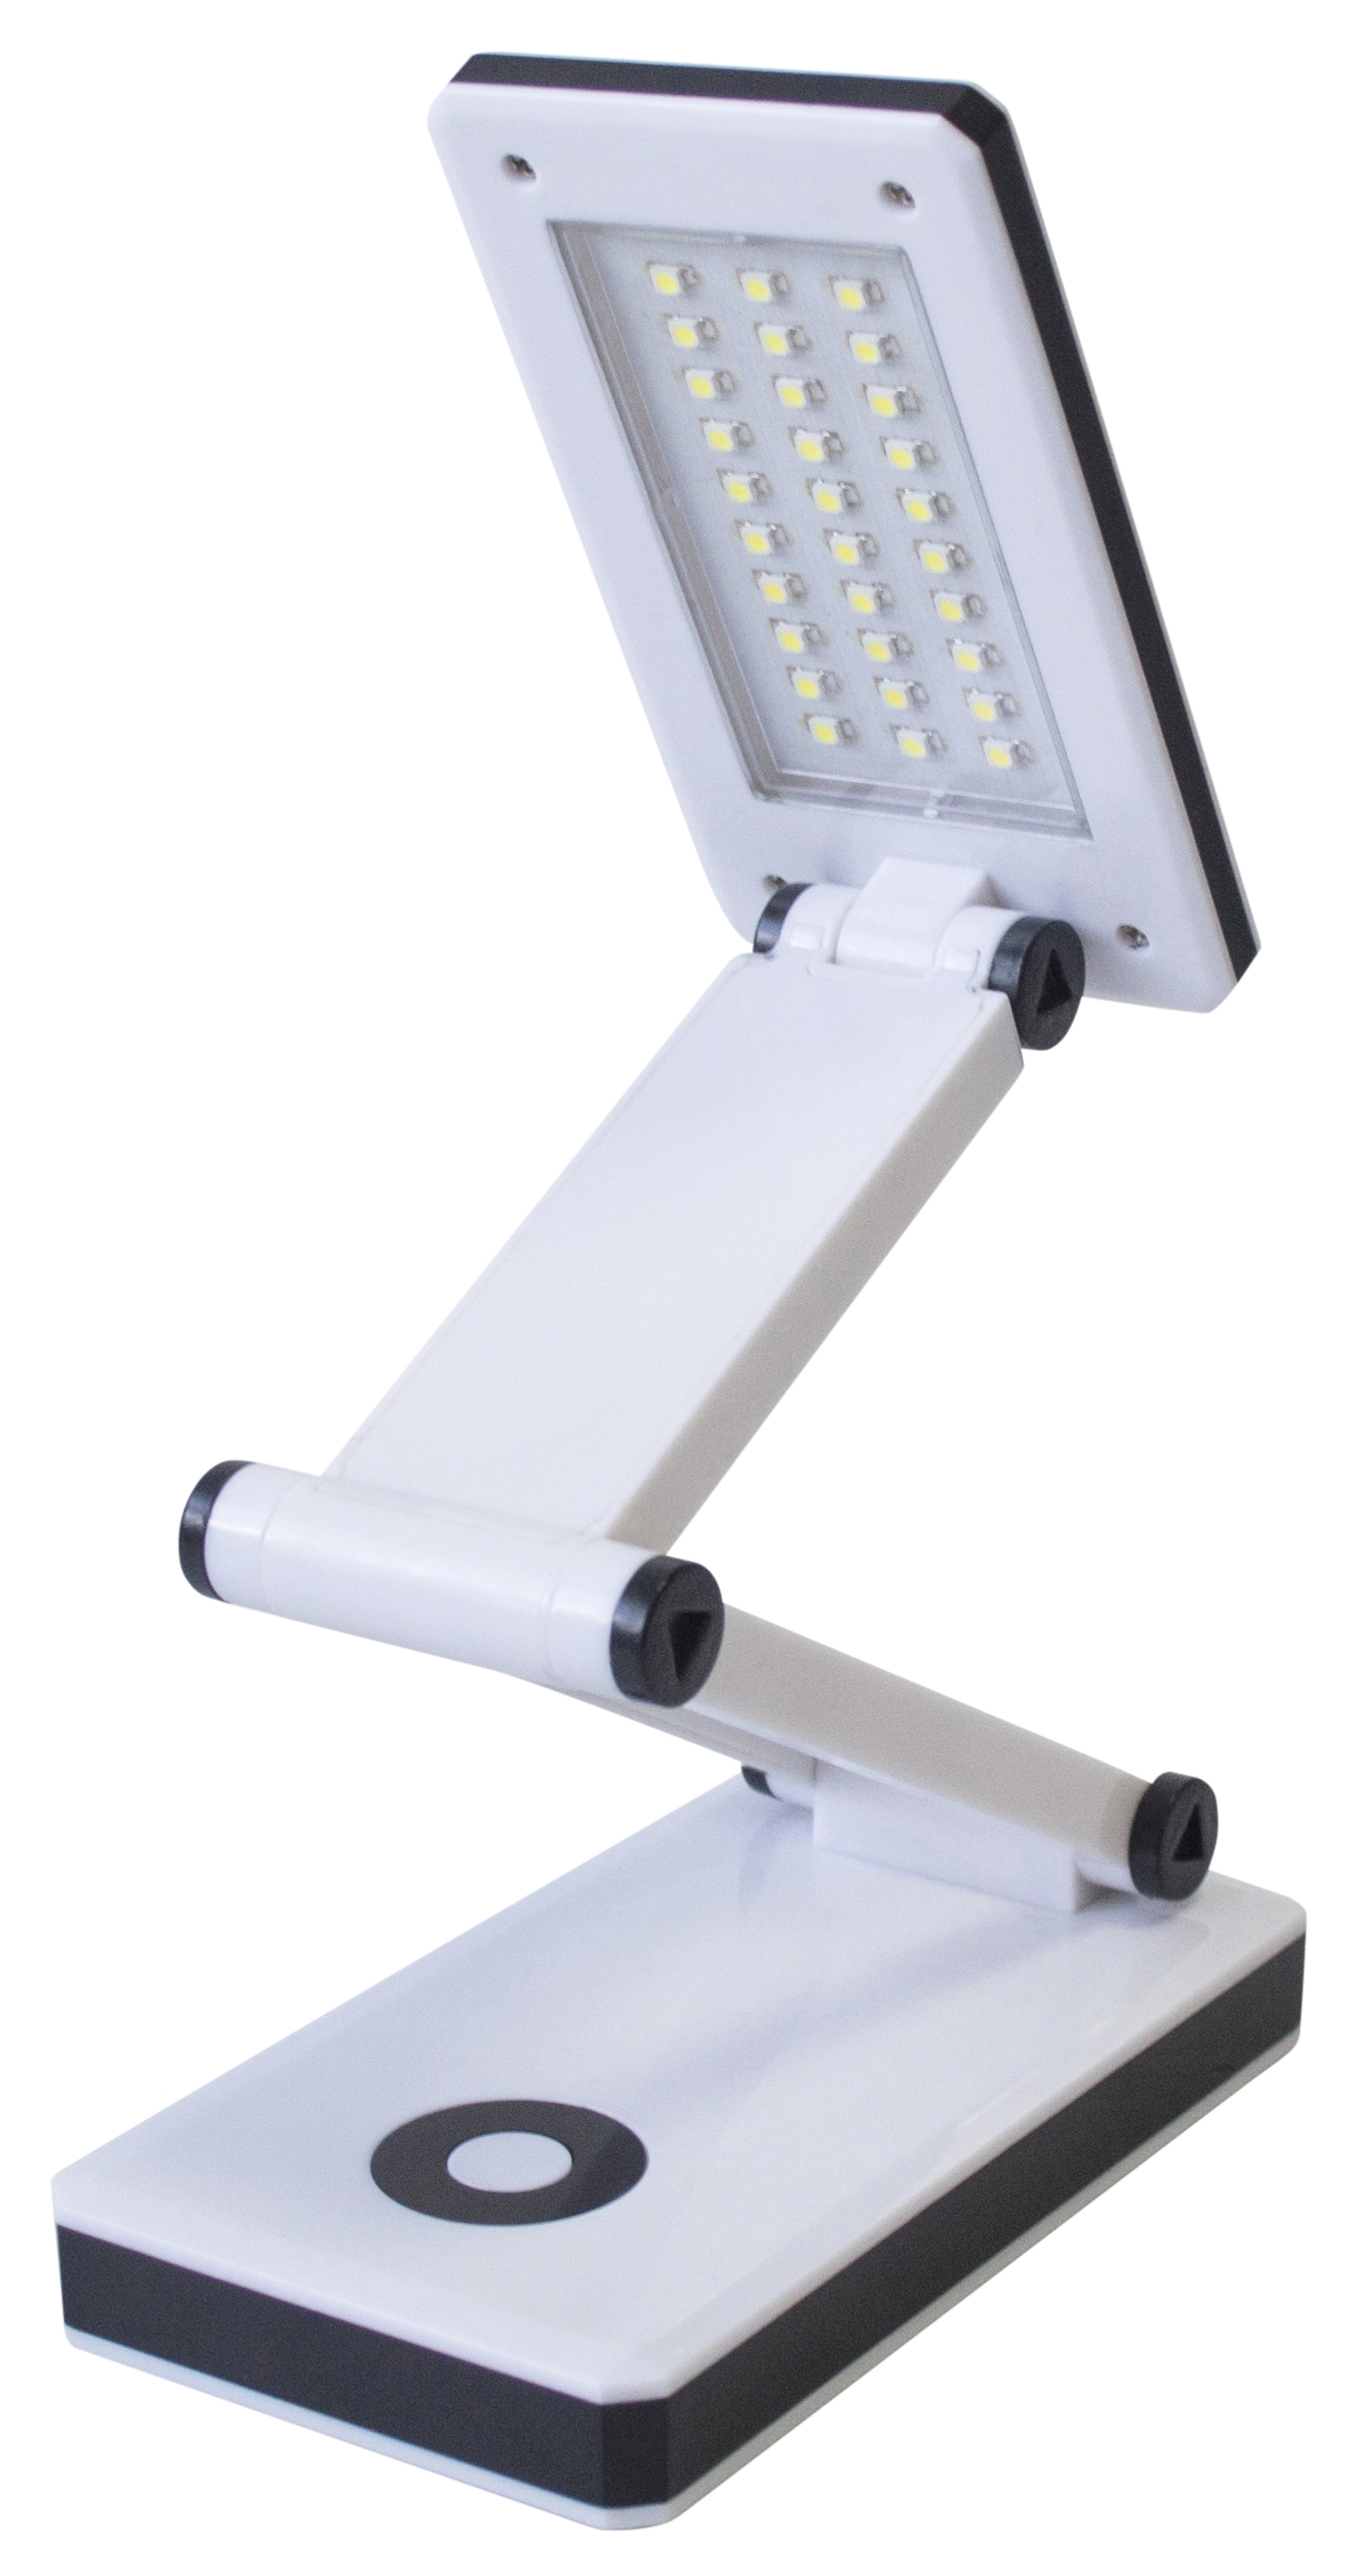 Smd 30 Bright Led Folding Table Light Reading Desk Lamp